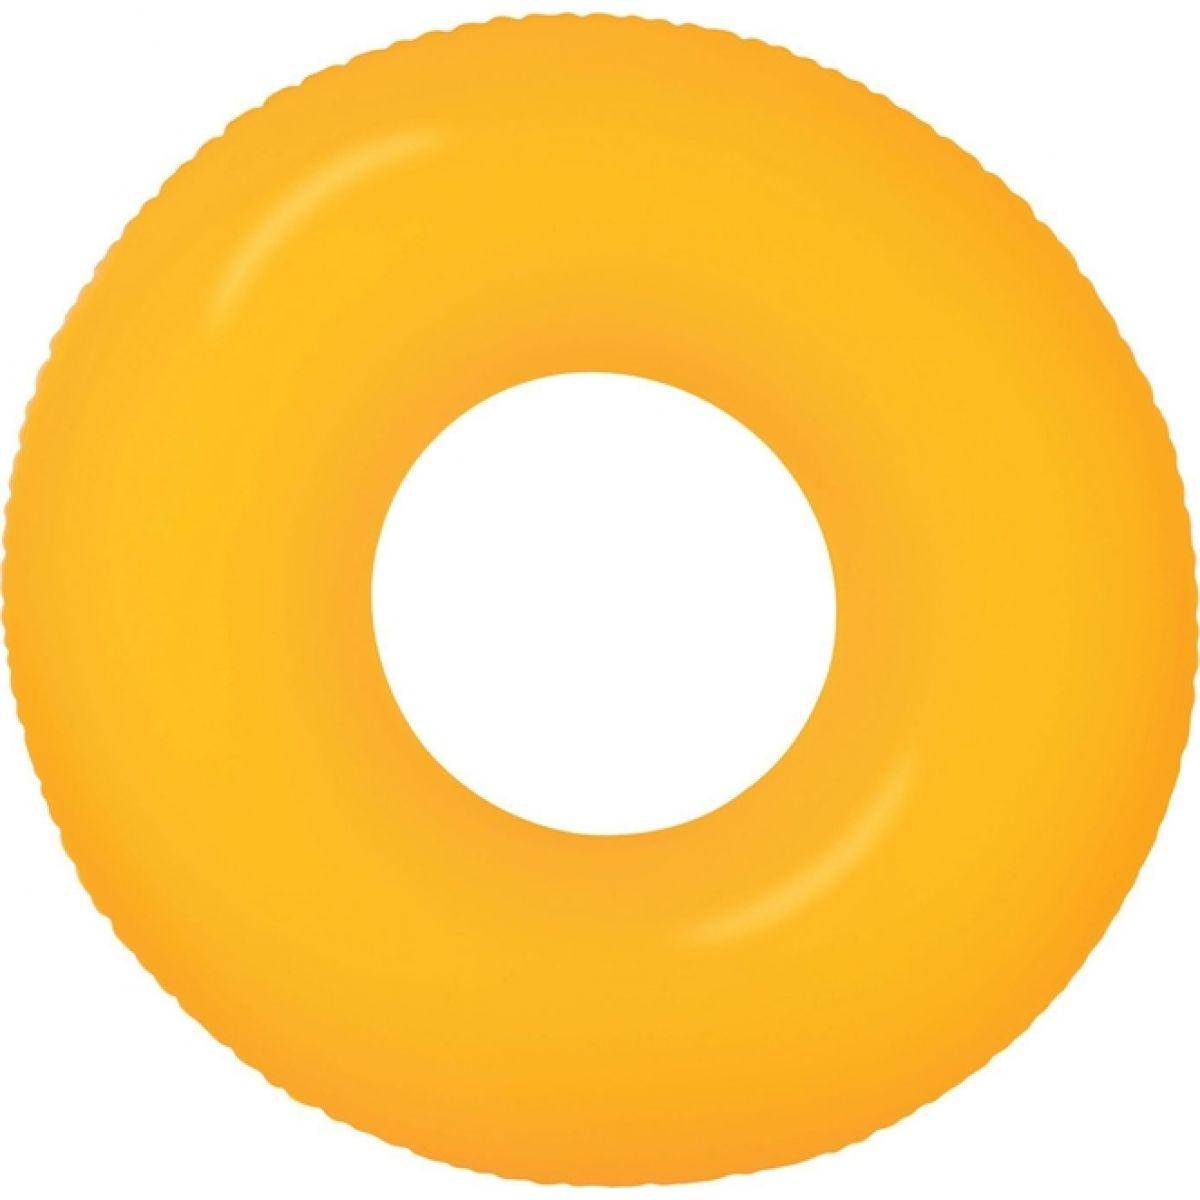 Plavací kruh 91cm Neon Frost Intex 59262 - Oranžová